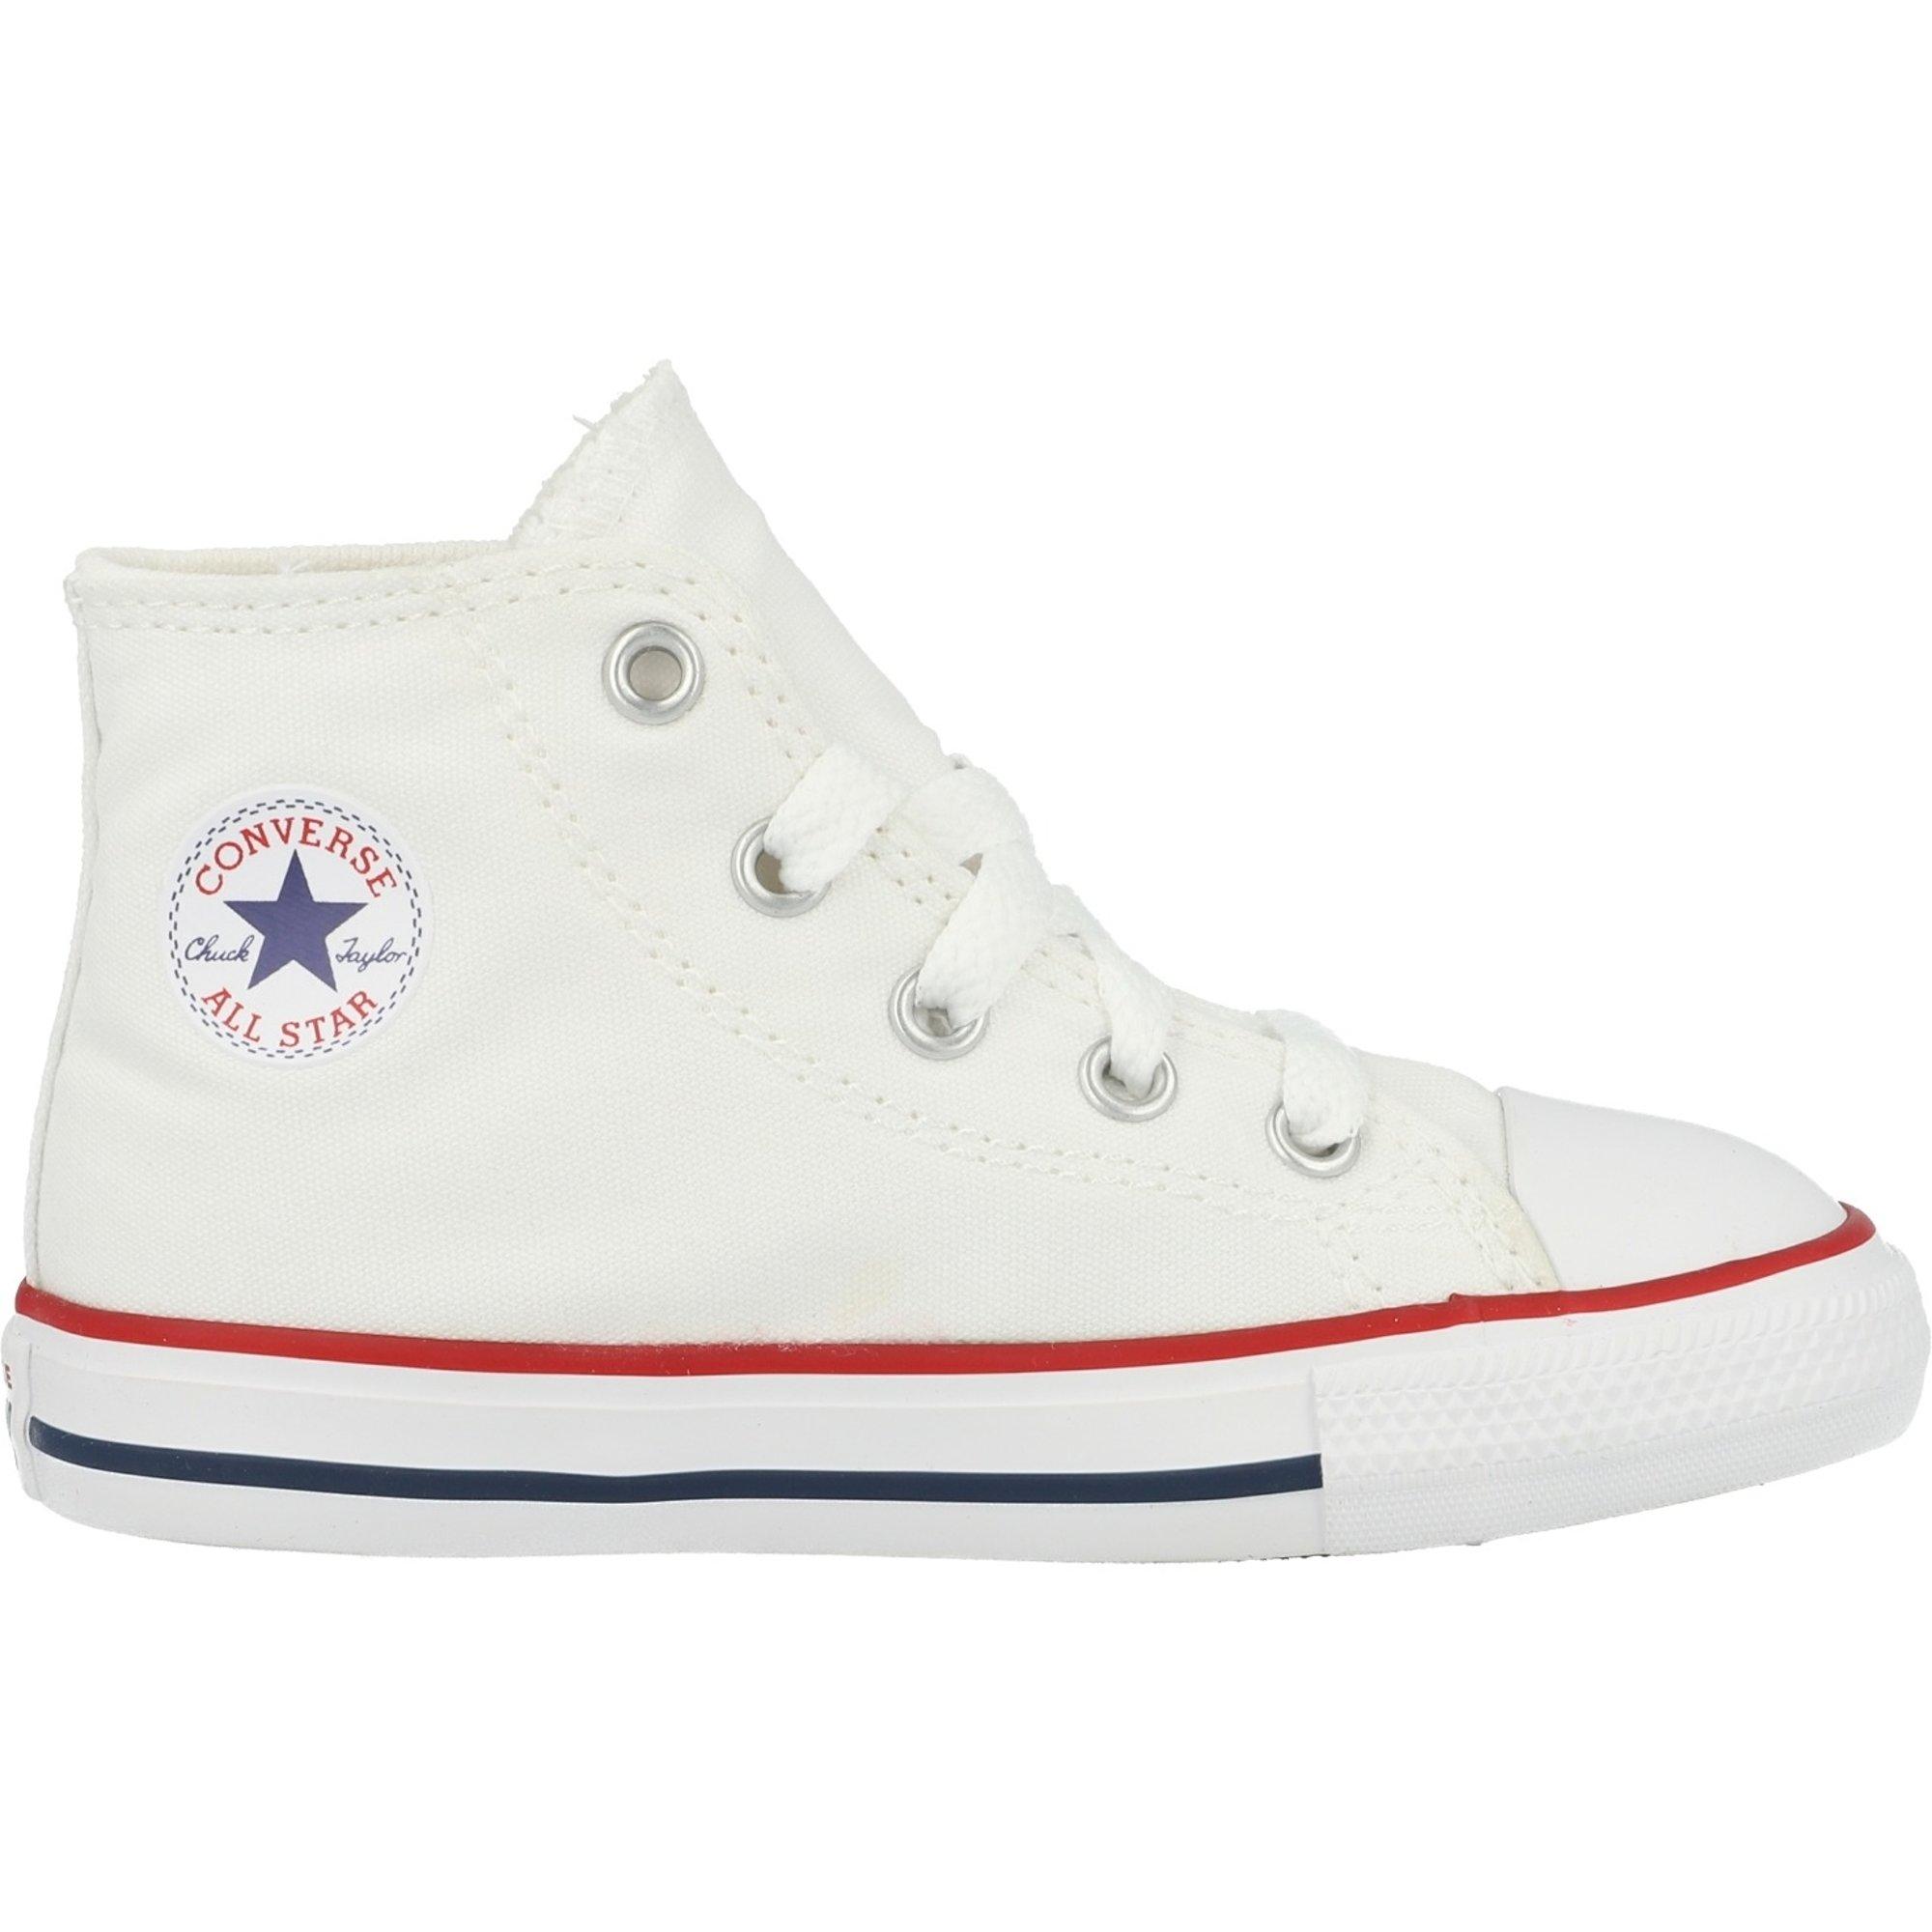 Converse Chuck Taylor All Star Hi Optical White Textile Infant